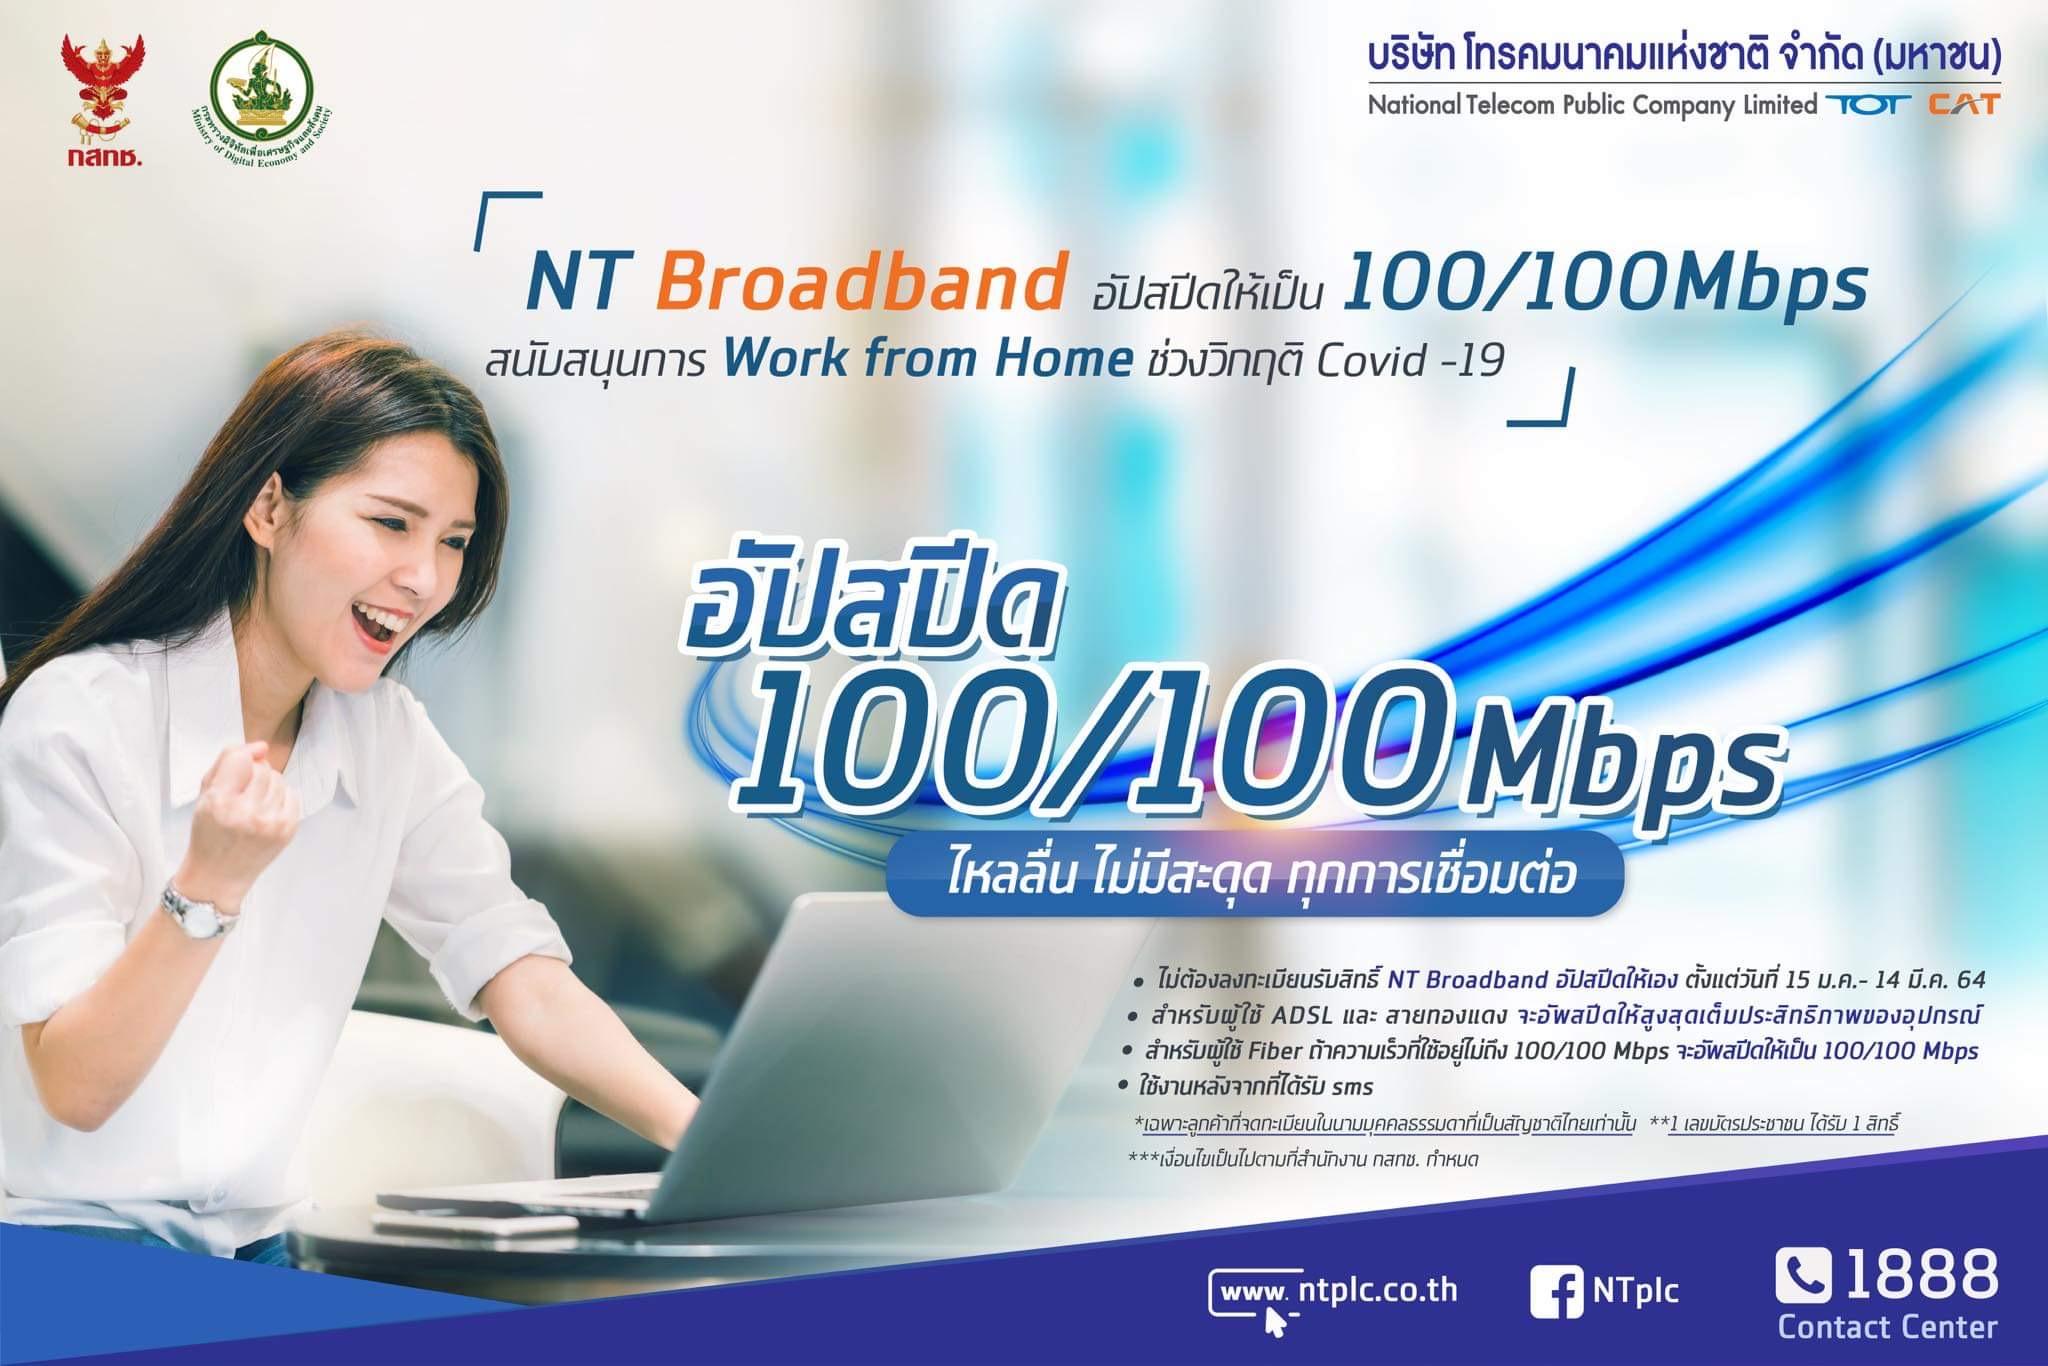 NT พร้อมอัปสปีดเน็ตบ้านแรงเว่อร์ 100/100 Mbps หนุน Work From Home ห่างไกลโควิด 19